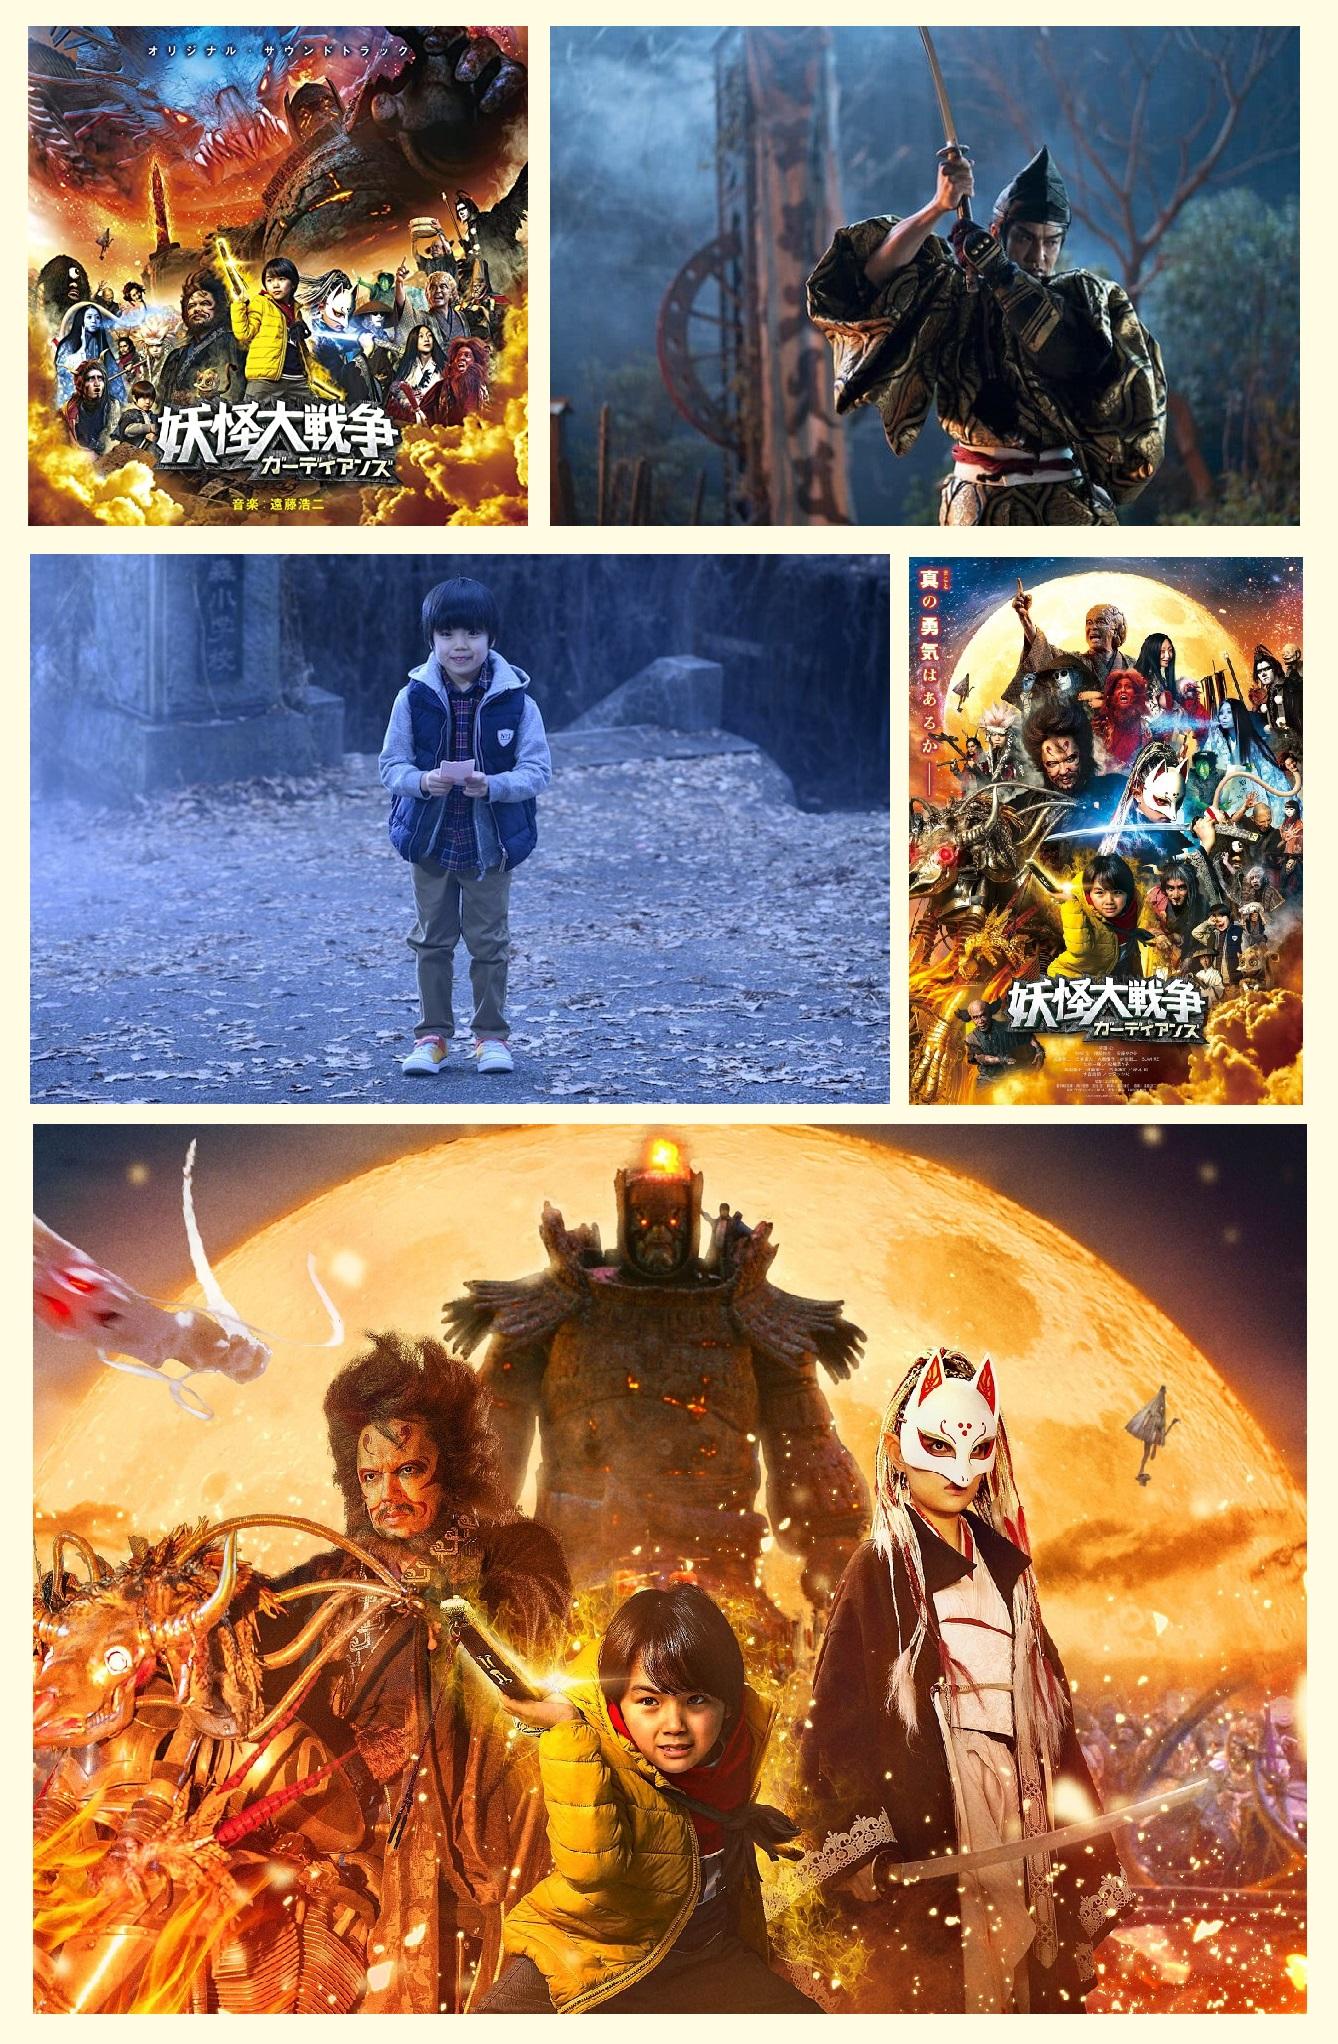 The Great Yokai War: Guardians (妖怪大戦争 ガーディアンズ)